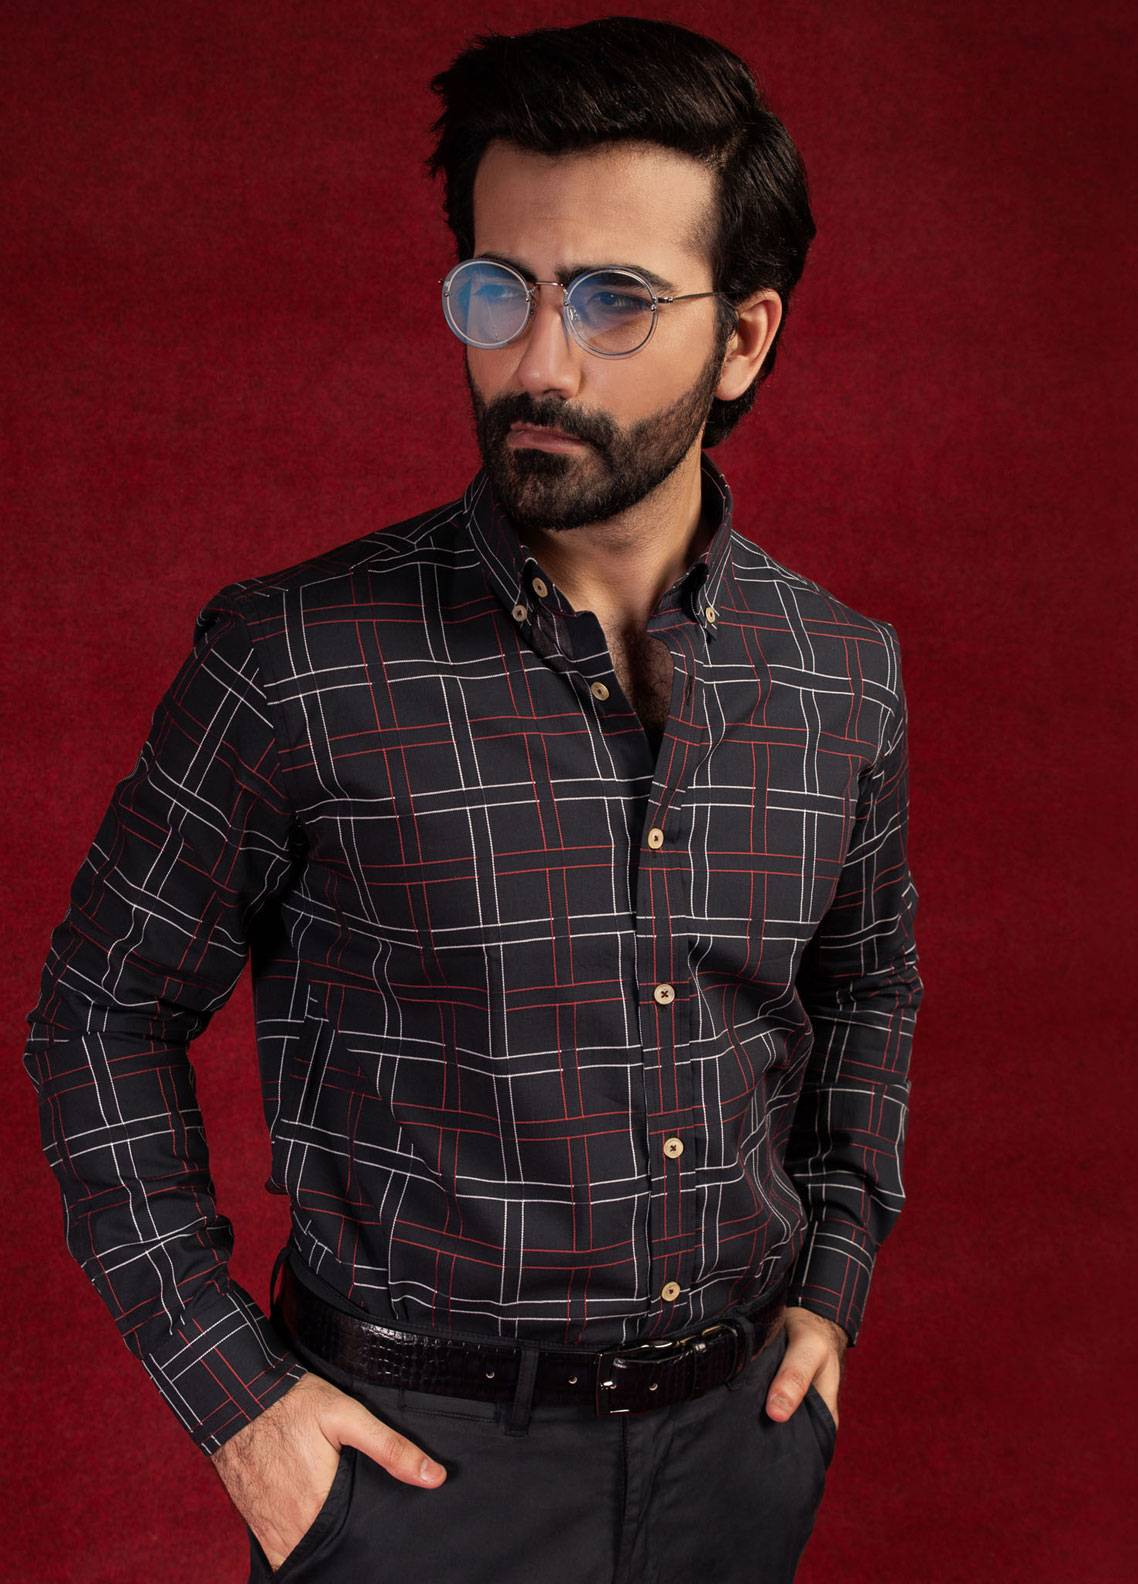 Brumano Cotton Formal Shirts for Men - Black BRM-652